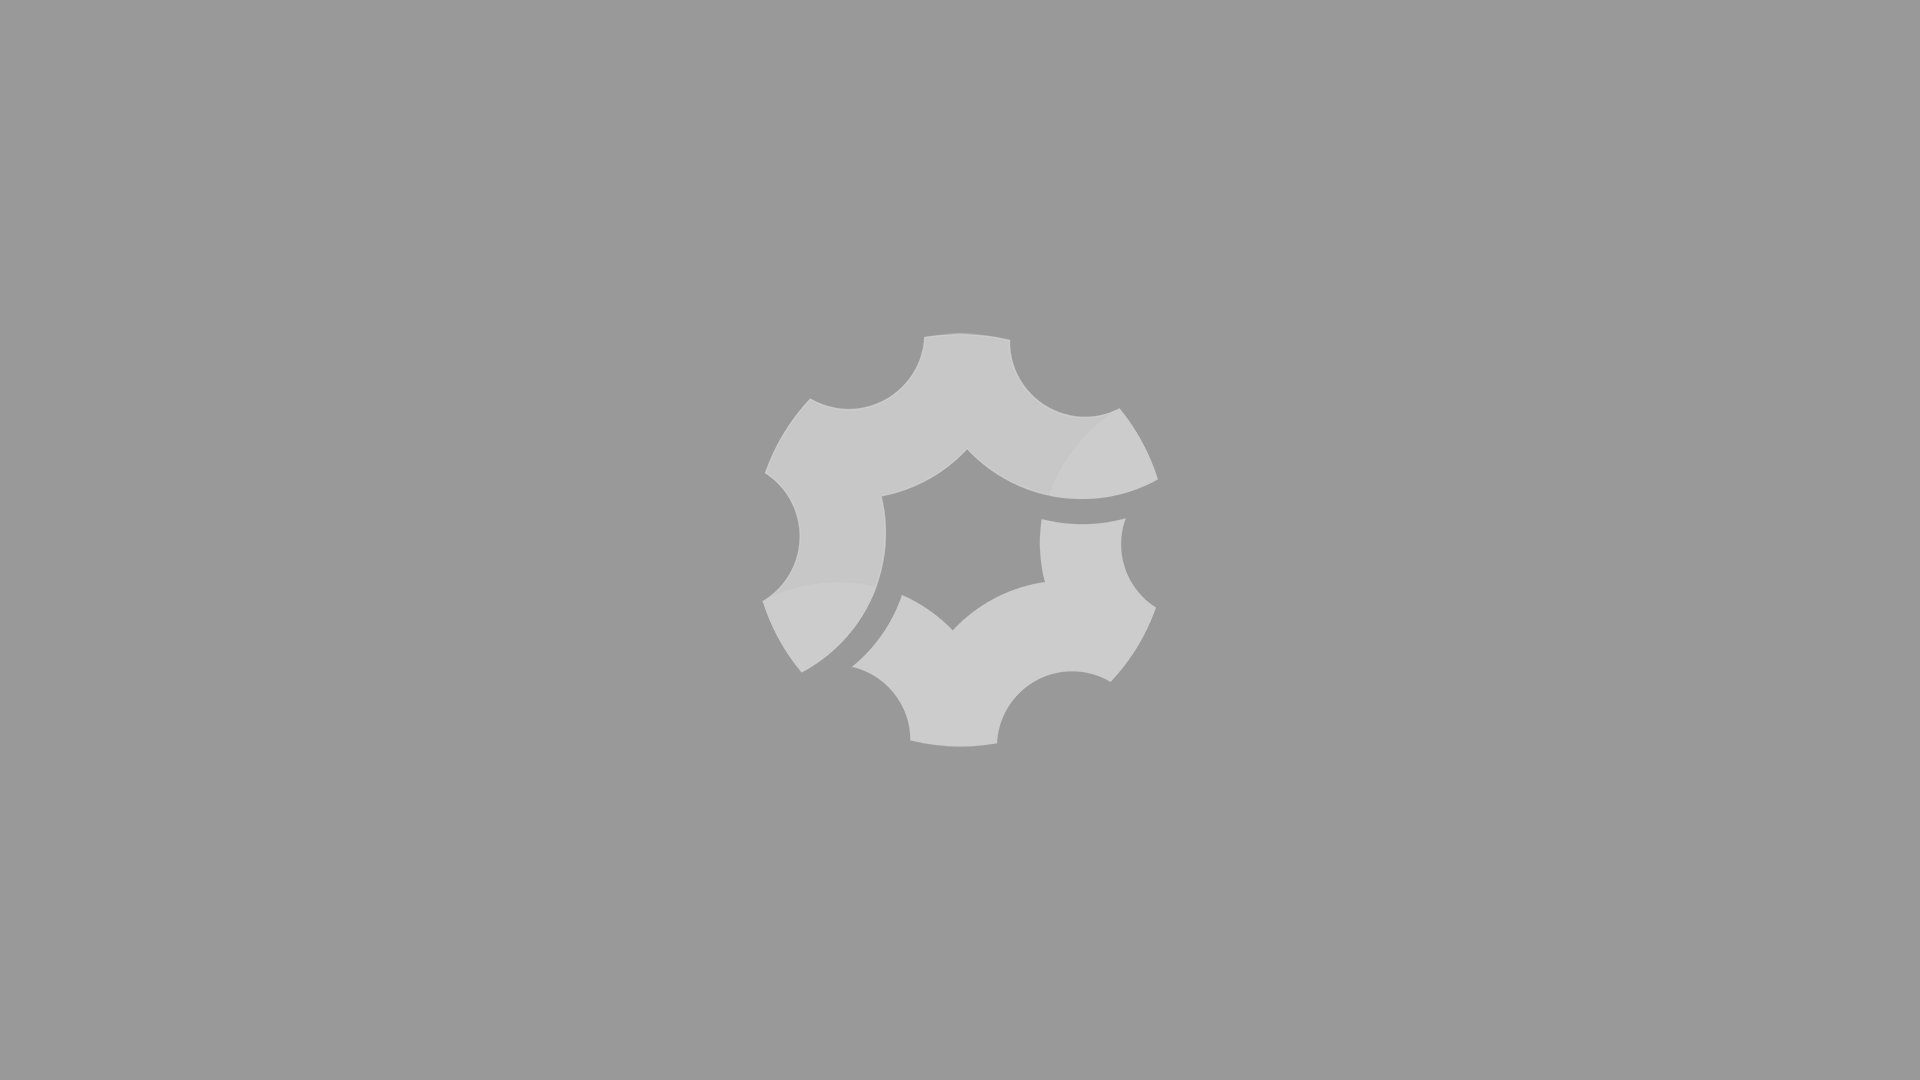 insurgency_sandstorm_screenshot_2020.05.01_-_00.08.13.33.png